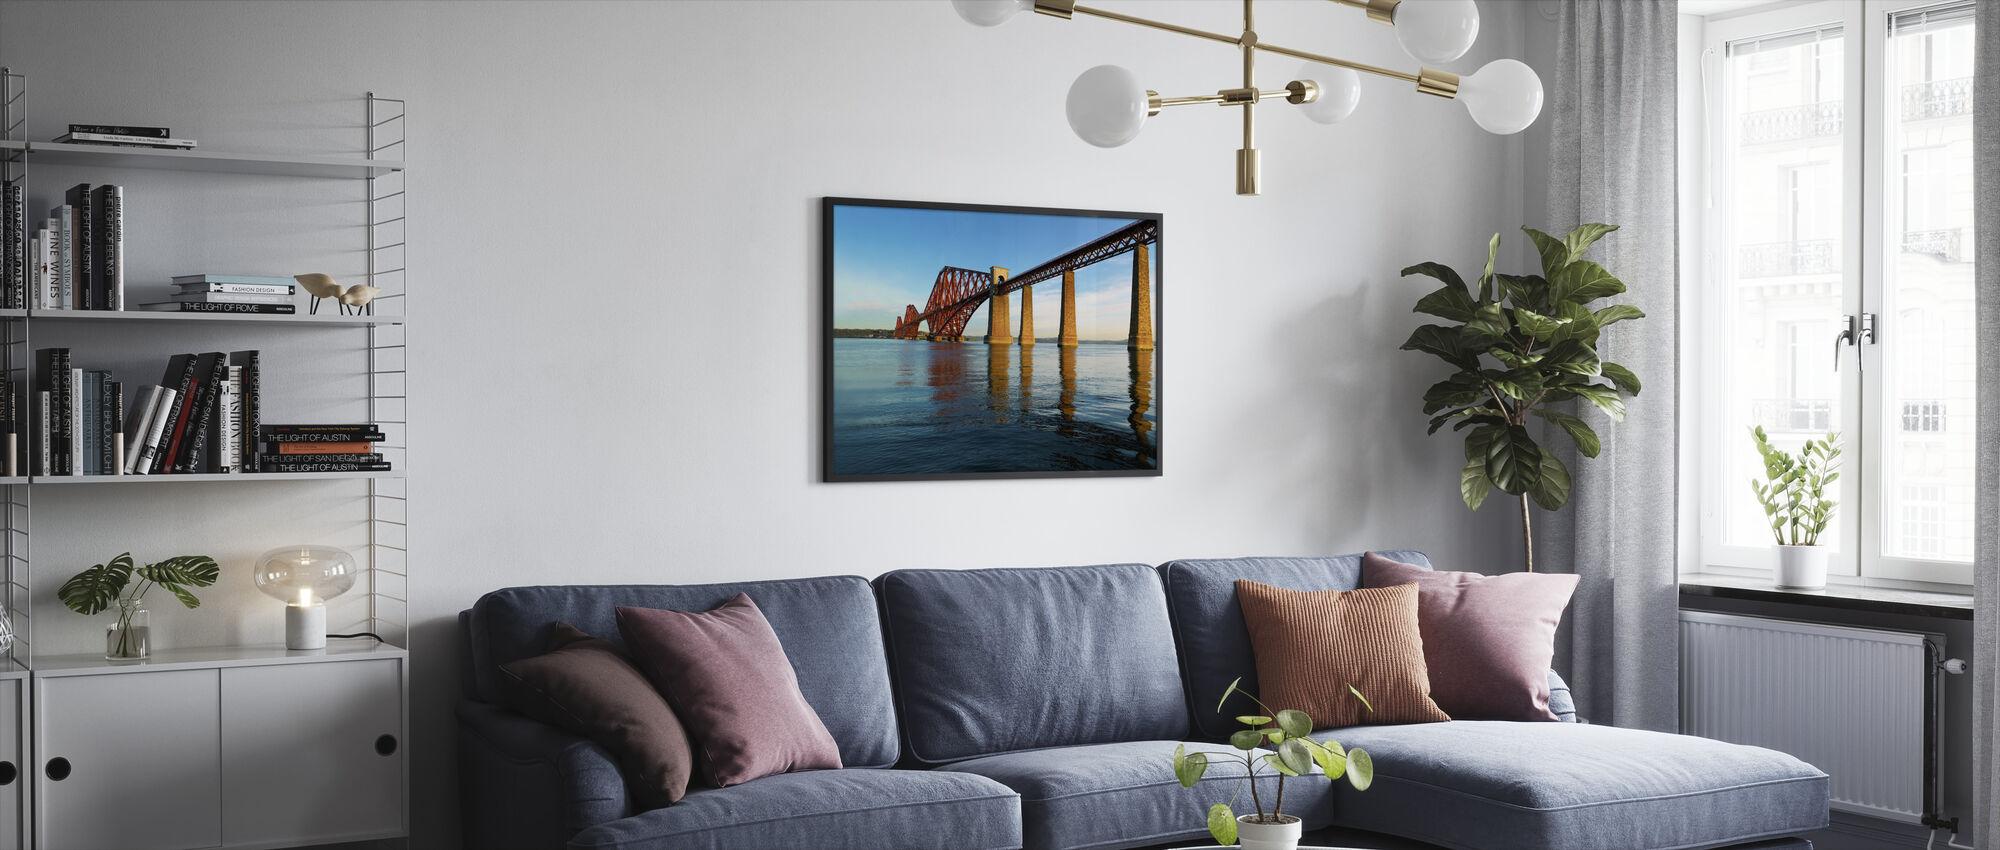 Dawn at Forth Road Bridge, Scotland - Framed print - Living Room